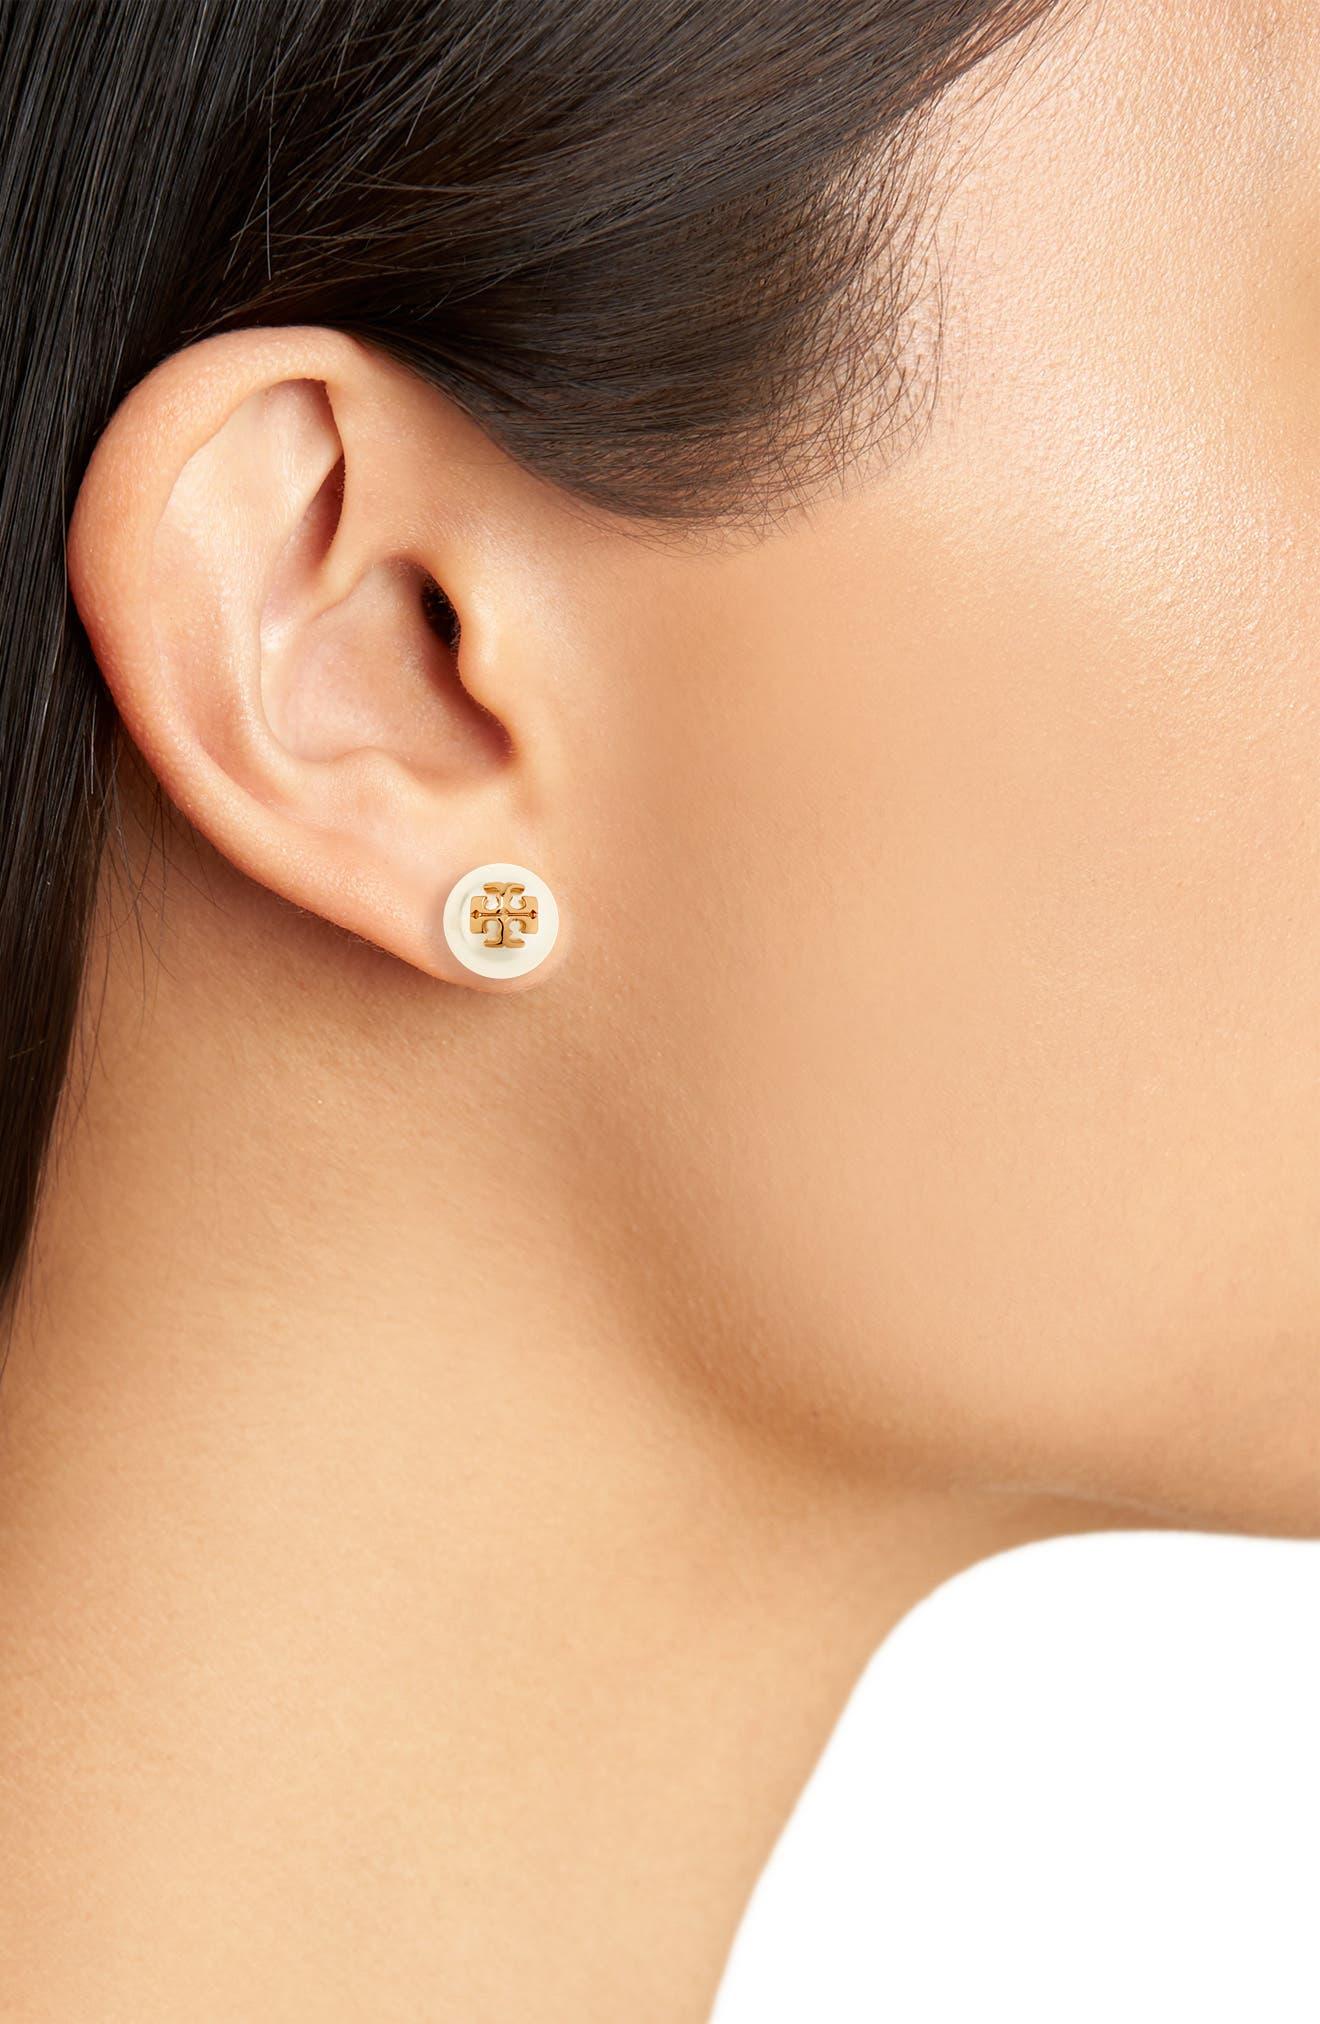 TORY BURCH, Swarovski Crystal Pearl Logo Stud Earrings, Main thumbnail 1, color, IVORY/ TORY GOLD